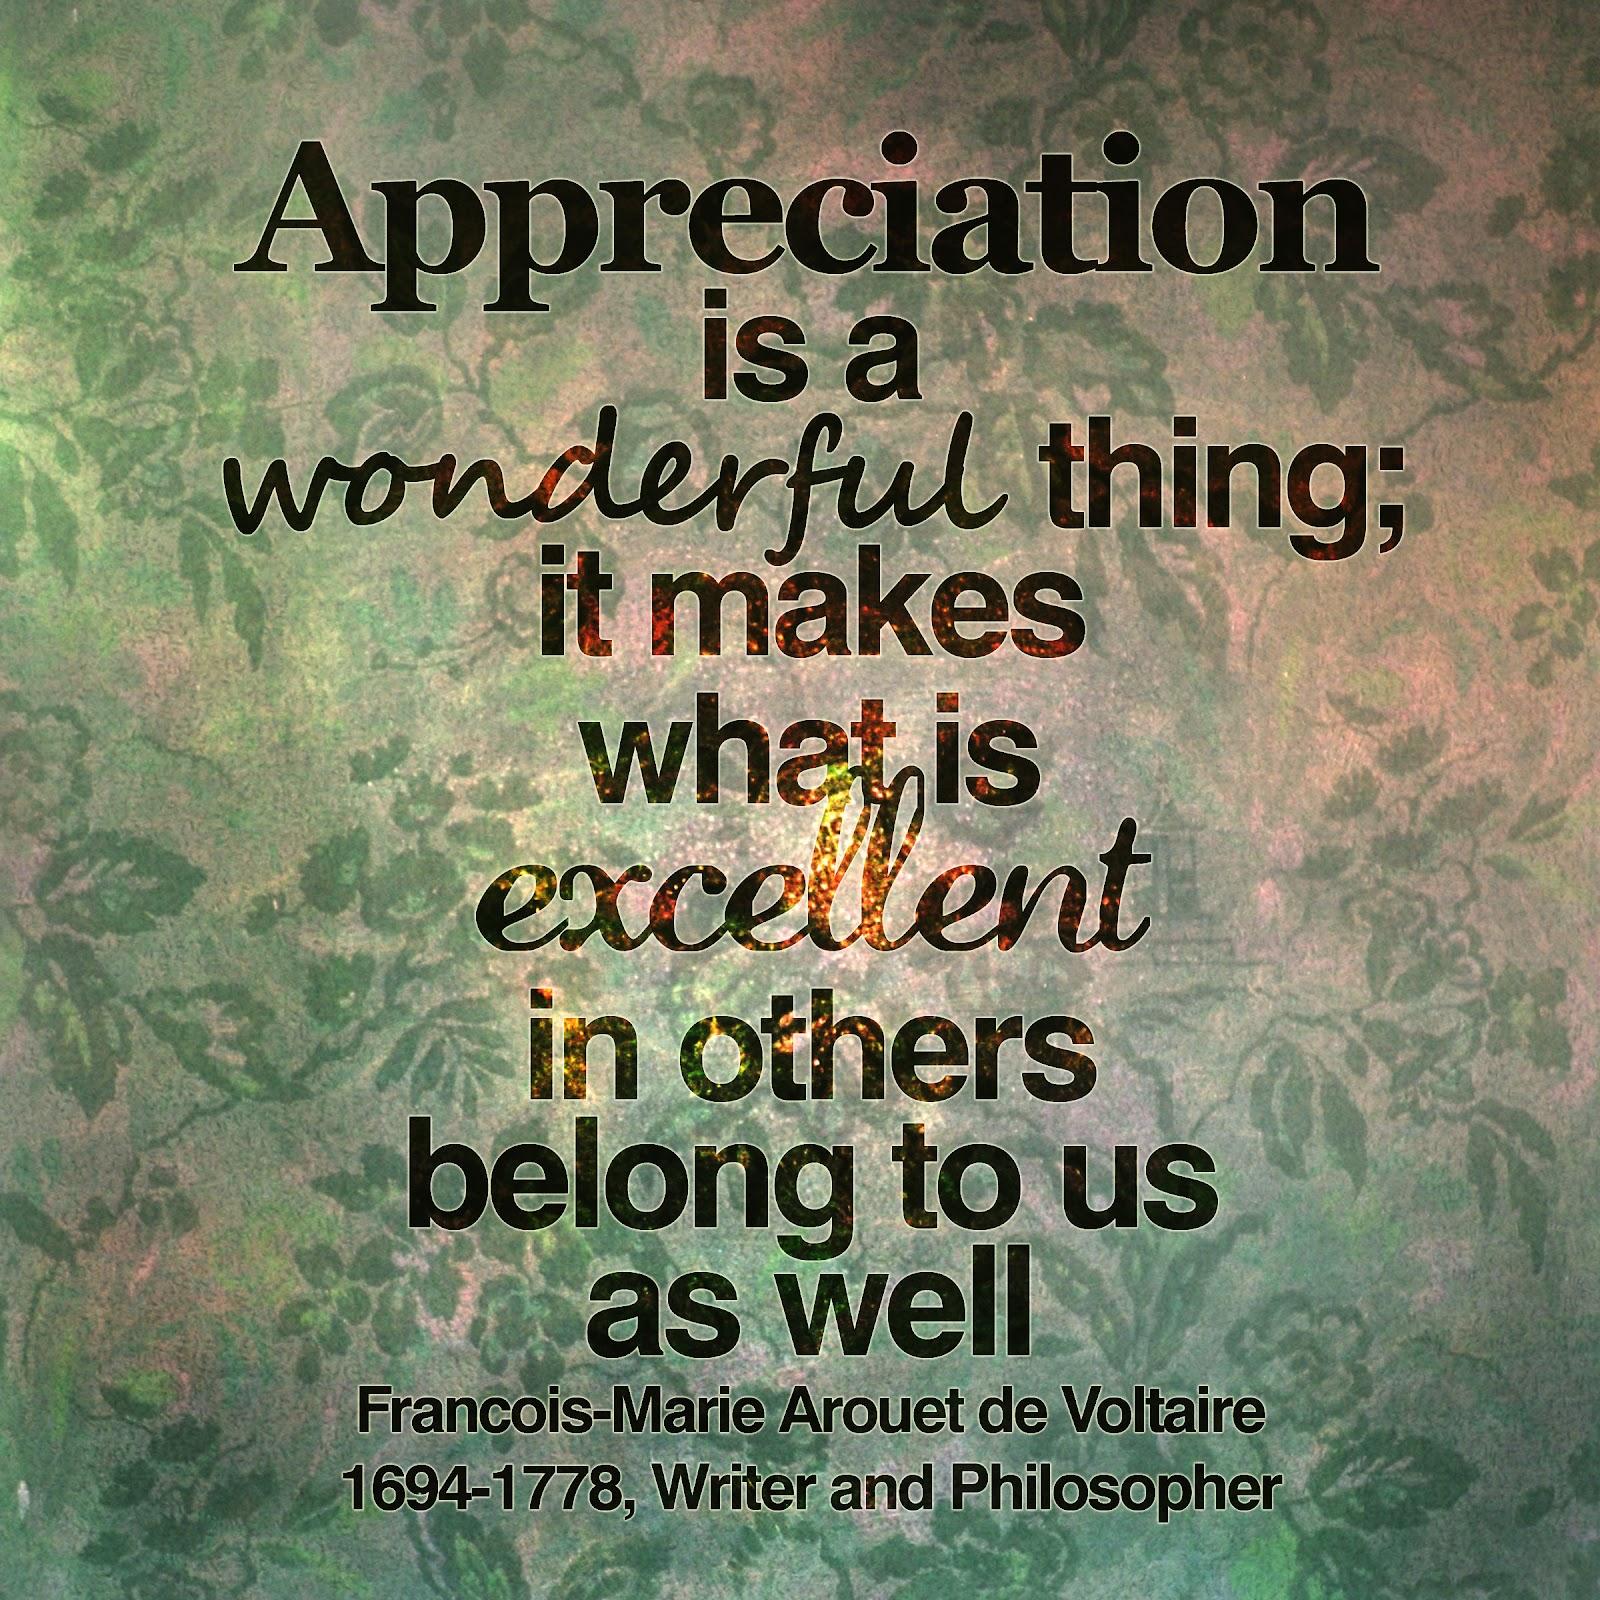 february appreciation copenhagen primary school london n1 0wf